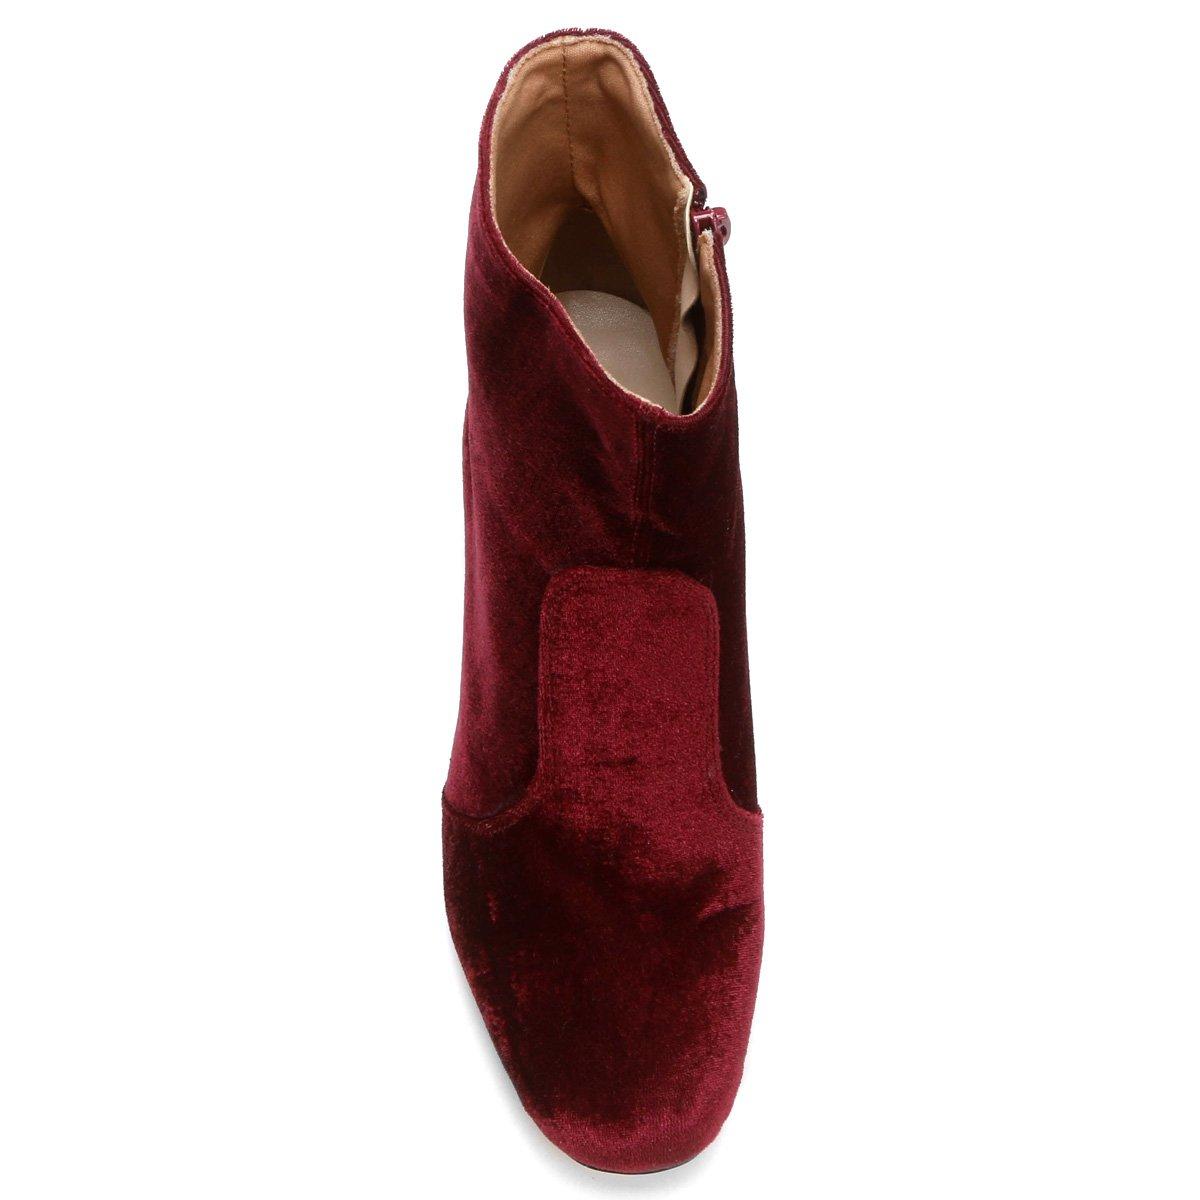 Shoestock Cano Vinho Bota Bota Cano Curto Shoestock Vinho Curto Bota vqYwWCS